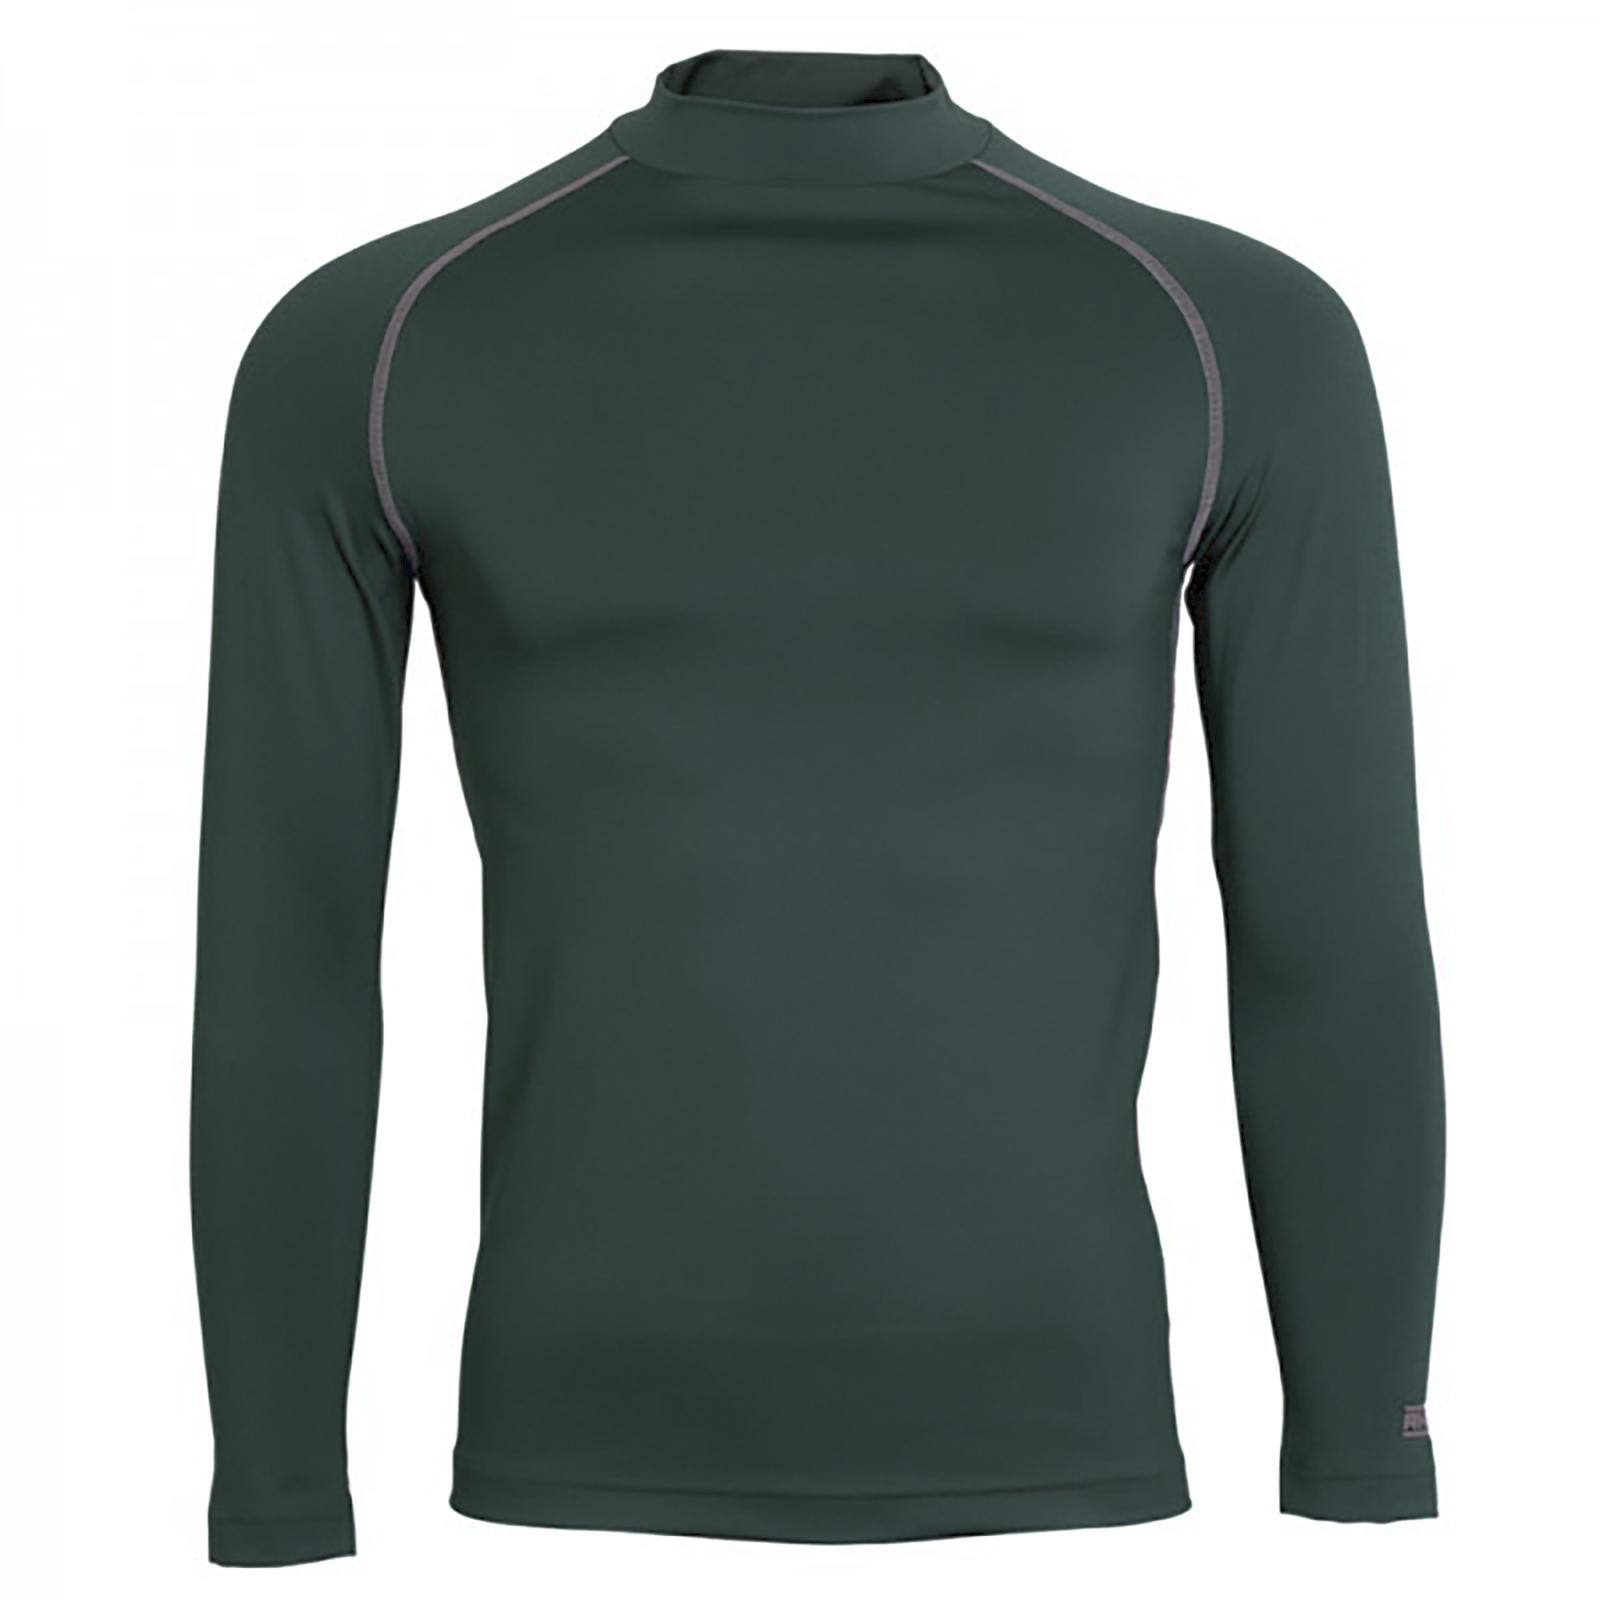 Rhino Mens Thermal Underwear Long Sleeve Base Layer Vest Top (XS) (Black Heather)